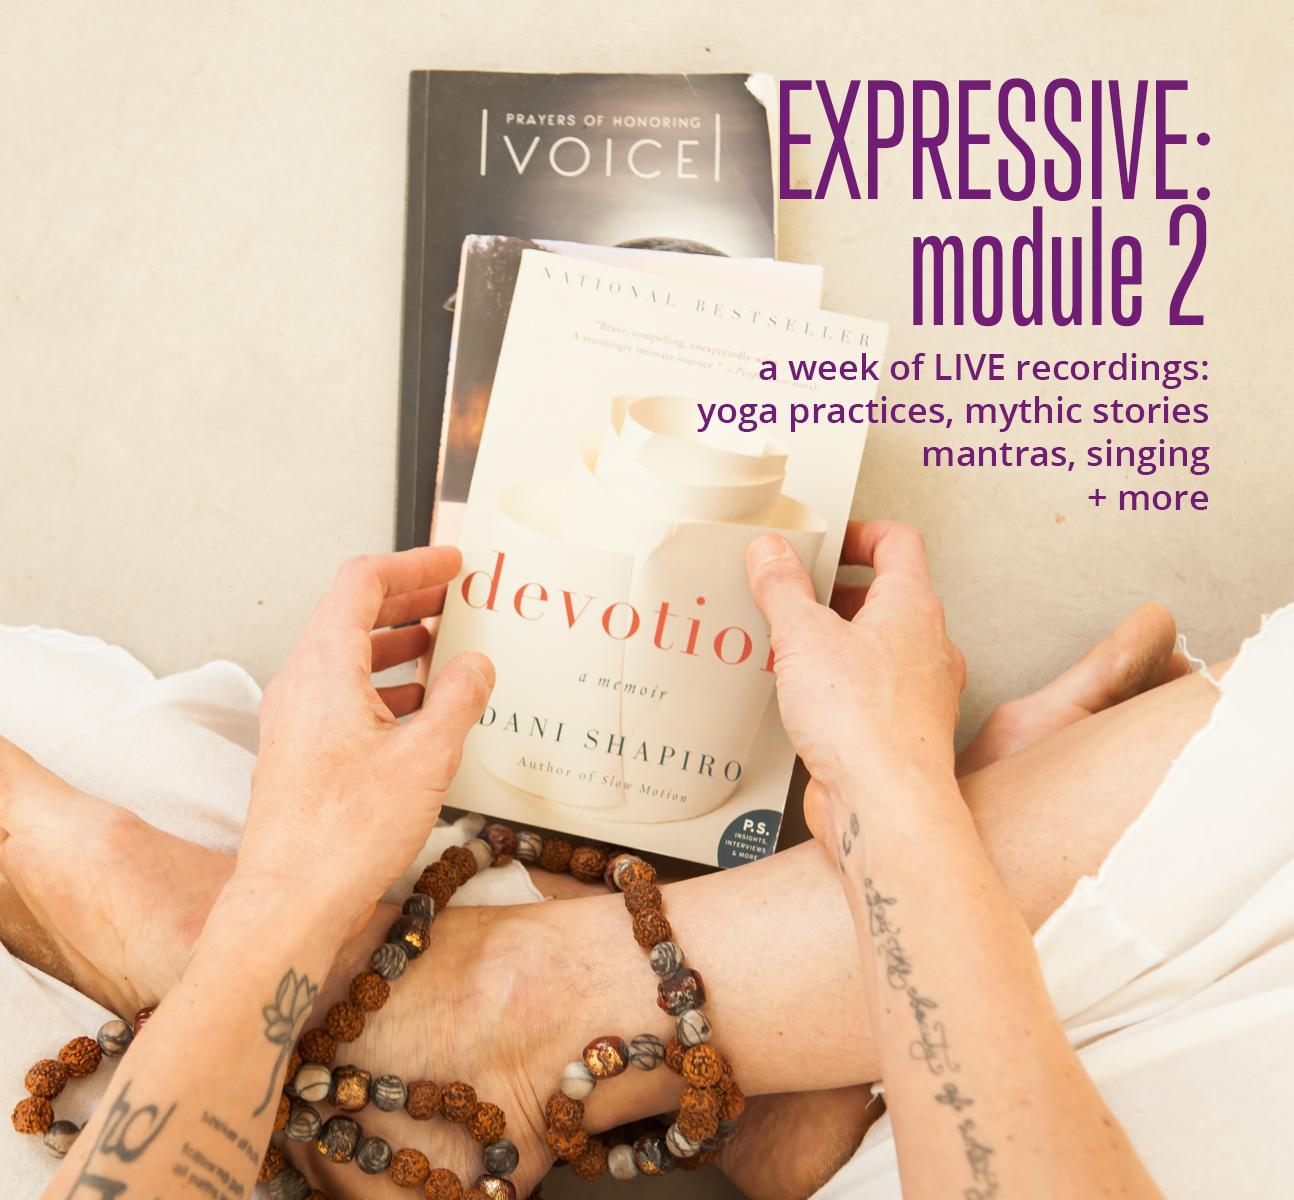 Module 2 Expressive Livestream Edited Advanced Yoga Training